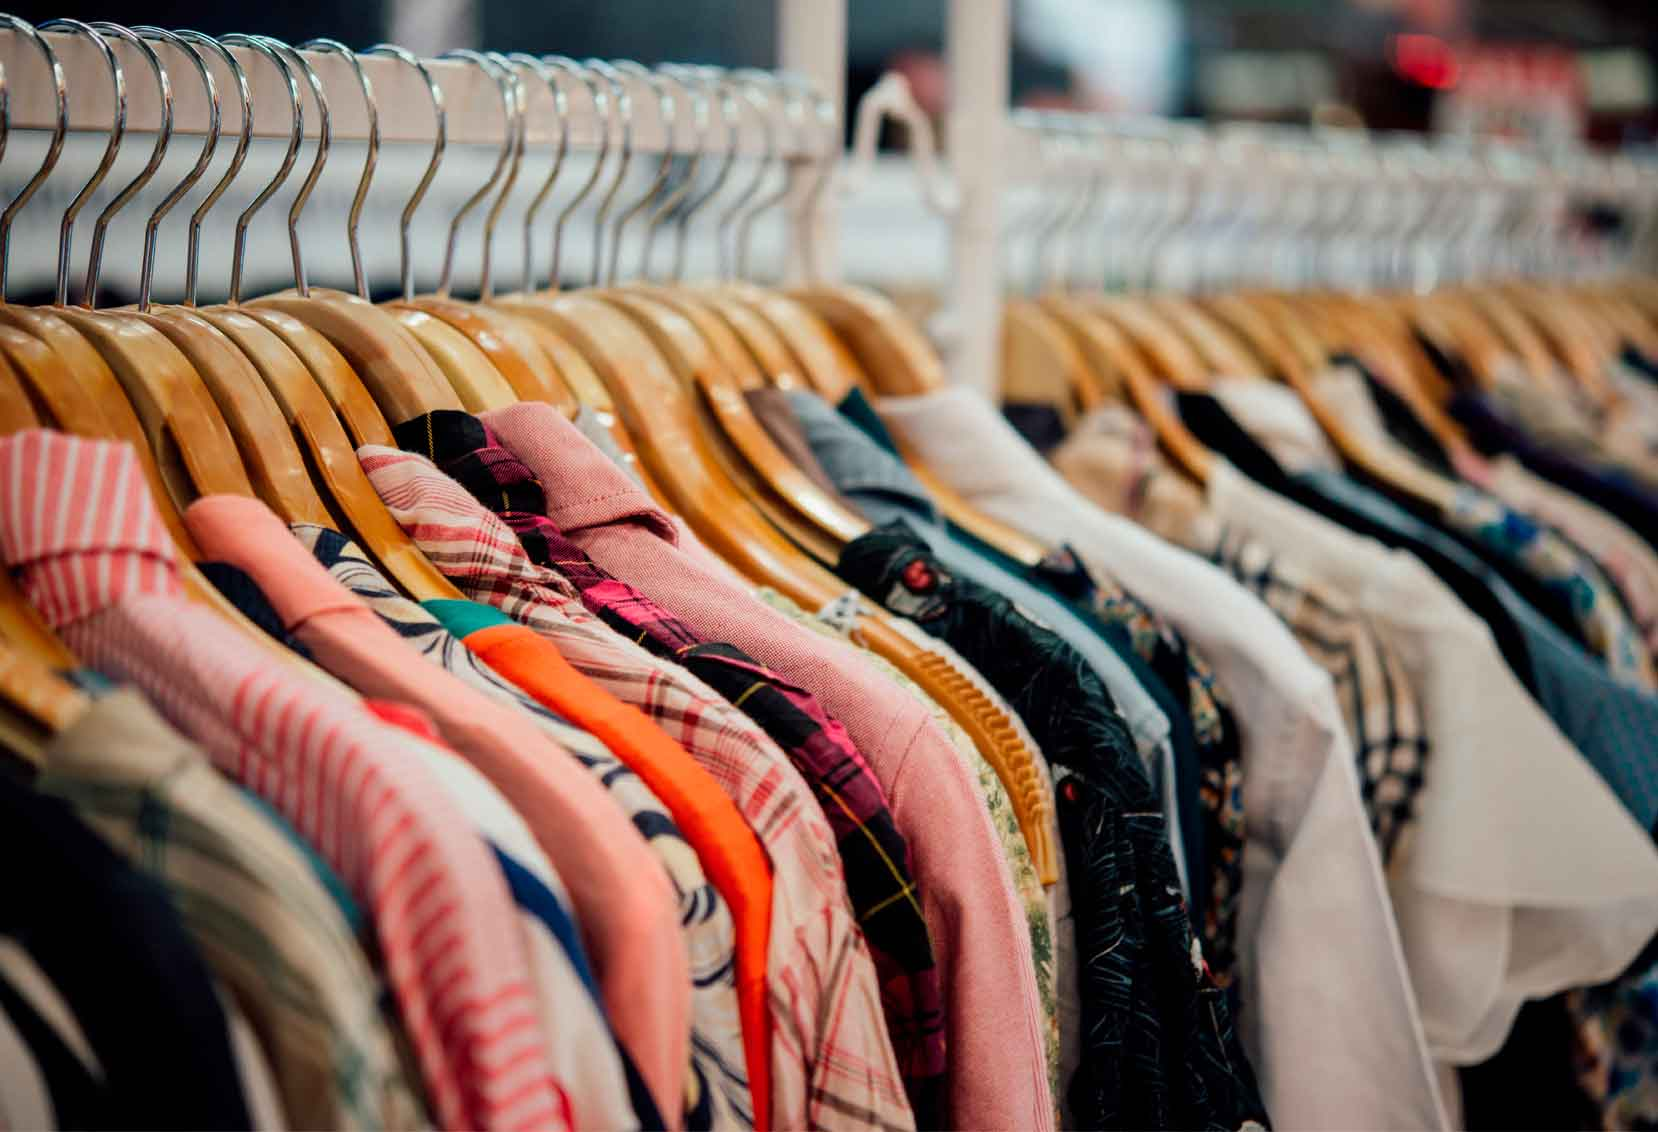 Sabe organizar o guarda-roupa?